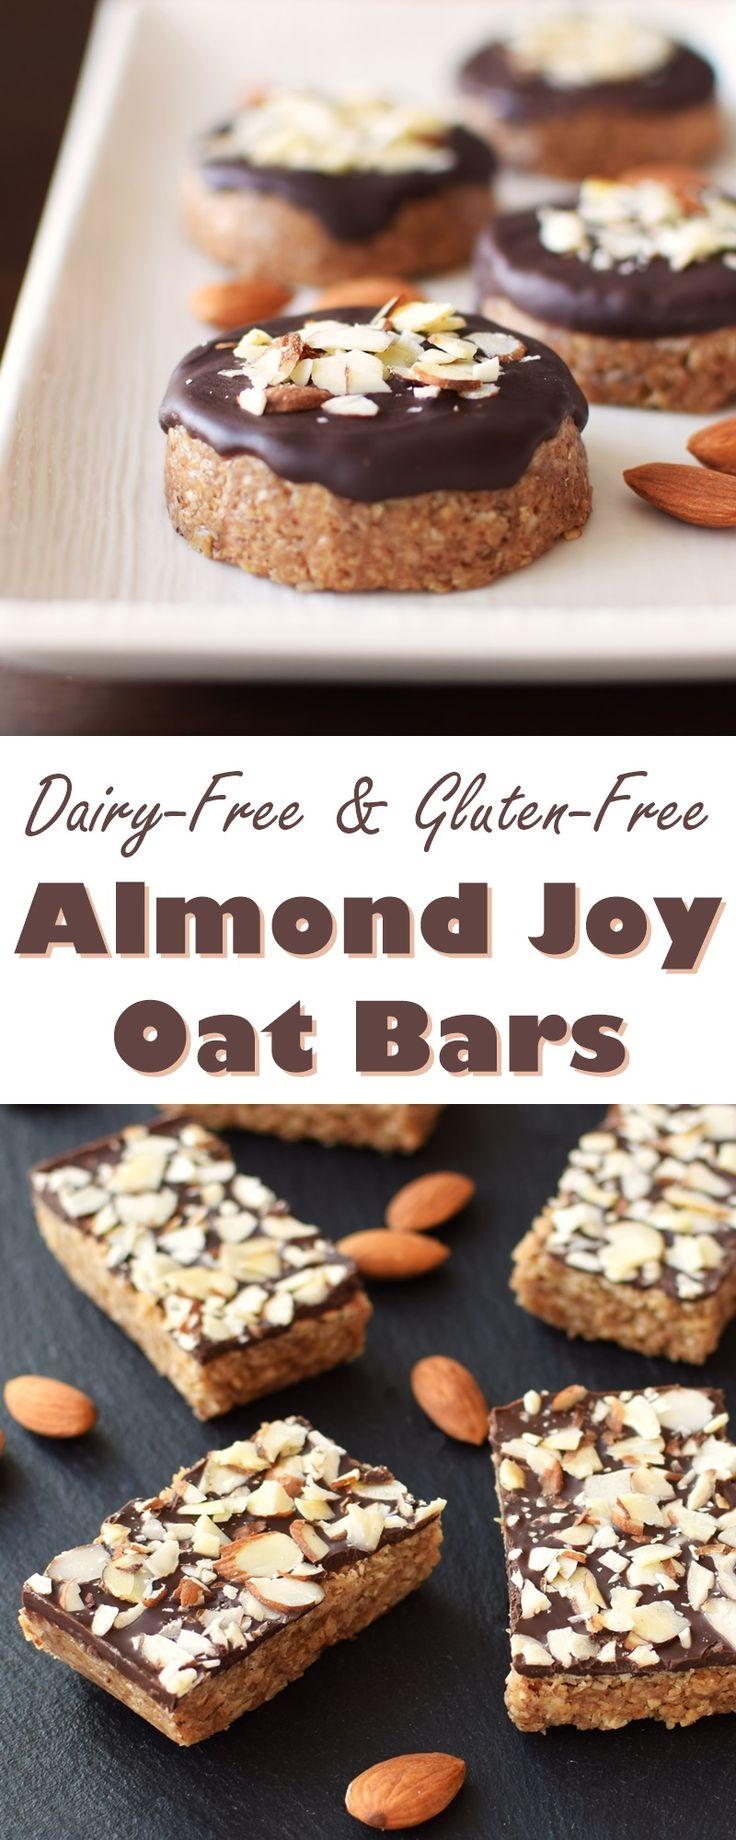 Almond Joy Oat Bars Recipe (Soft and Chewy) - no bake, dairy-free, gluten-free, vegan